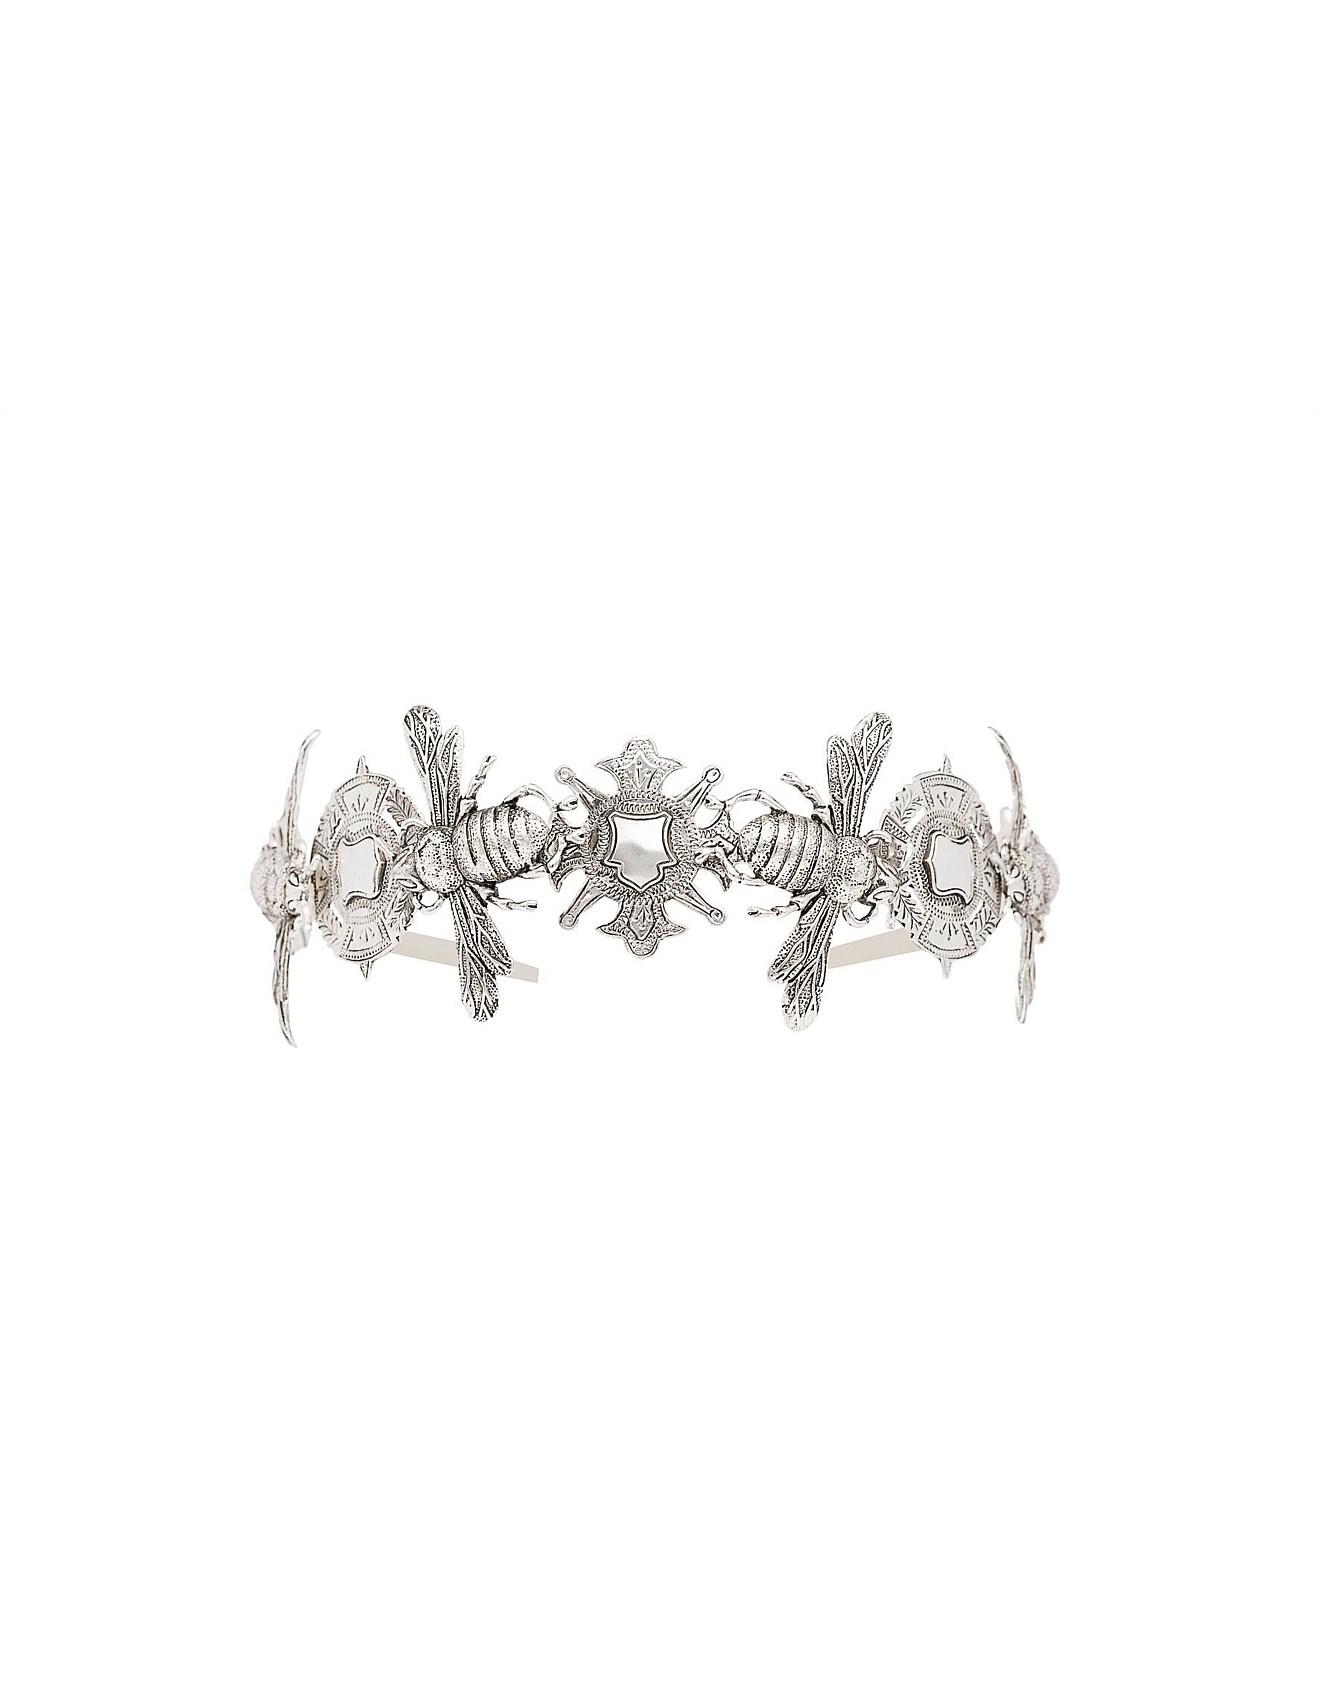 Kitte Buy Kitte Jewellery Online David Jones